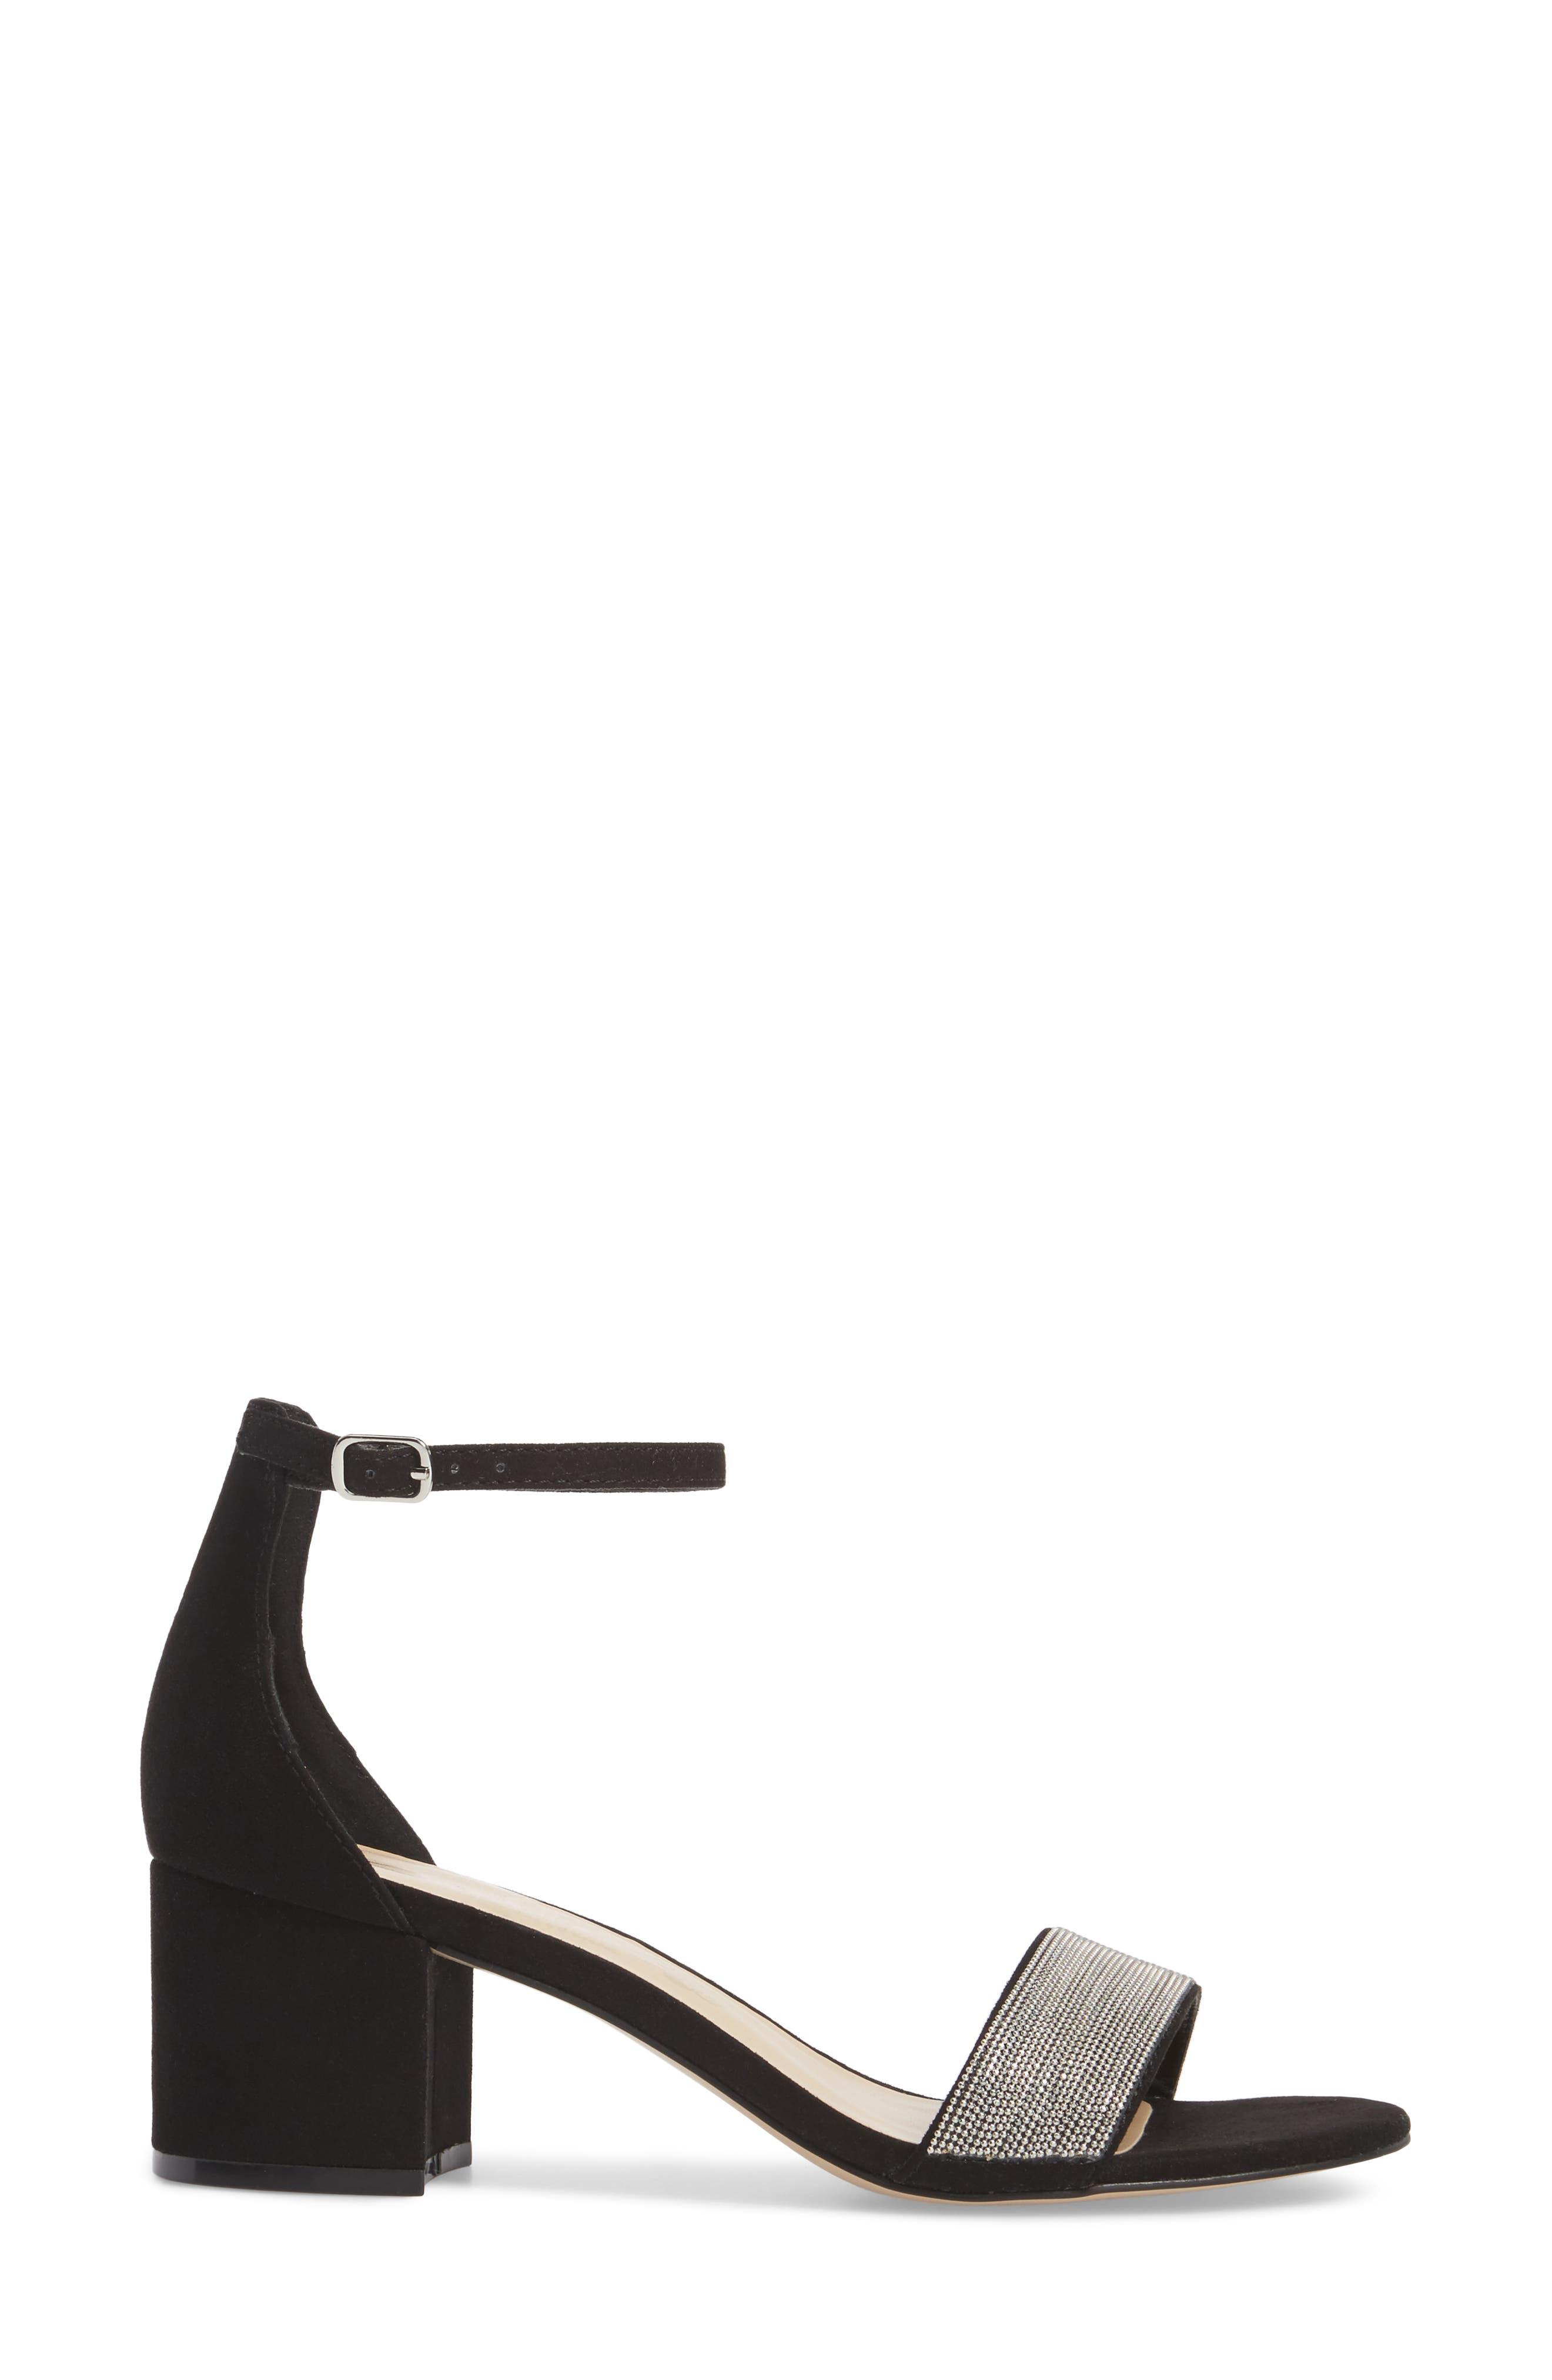 Jazmine Ankle Strap Sandal,                             Alternate thumbnail 3, color,                             Black Suede